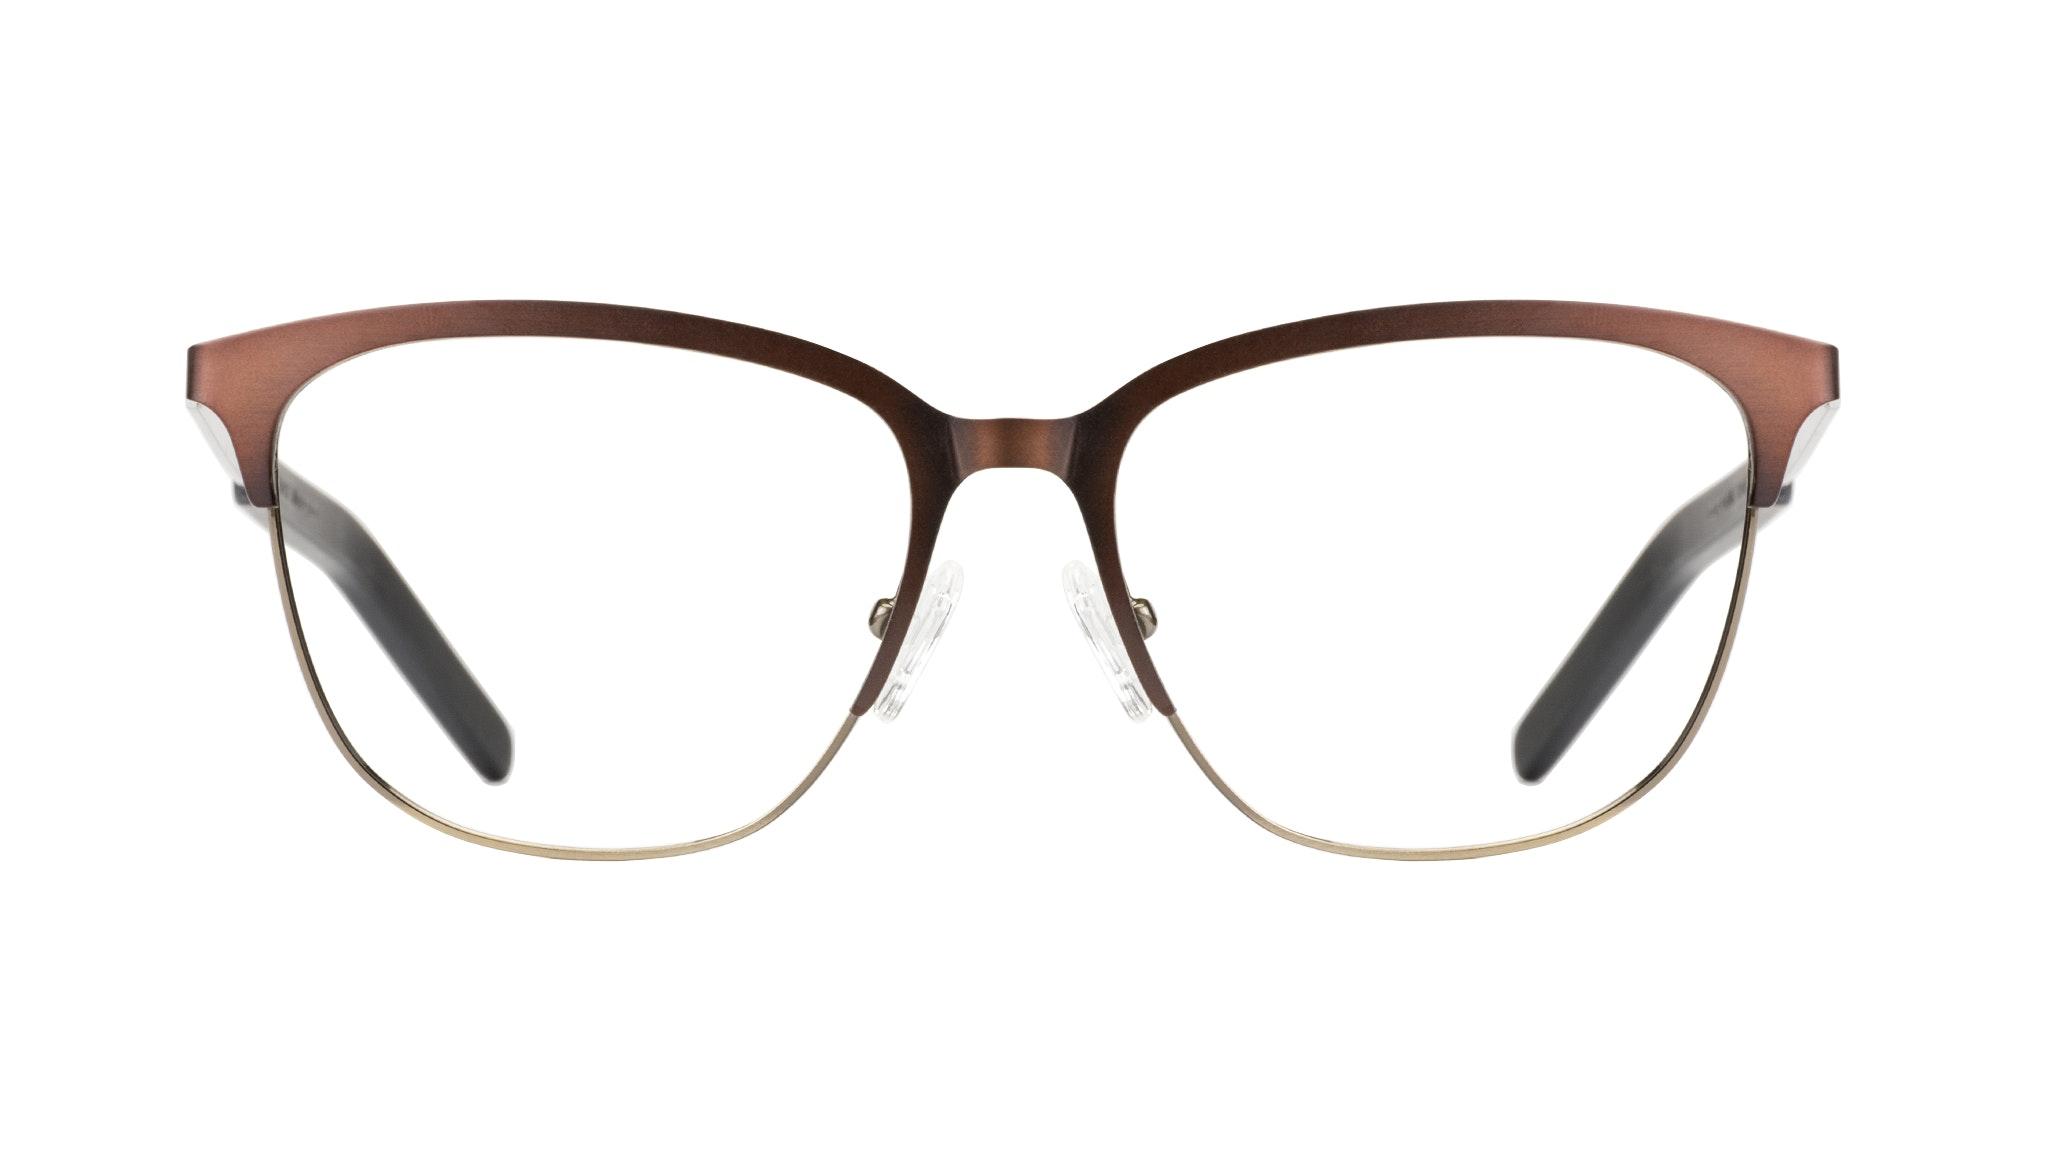 Affordable Fashion Glasses Rectangle Eyeglasses Men Legacy Mud Gold Front